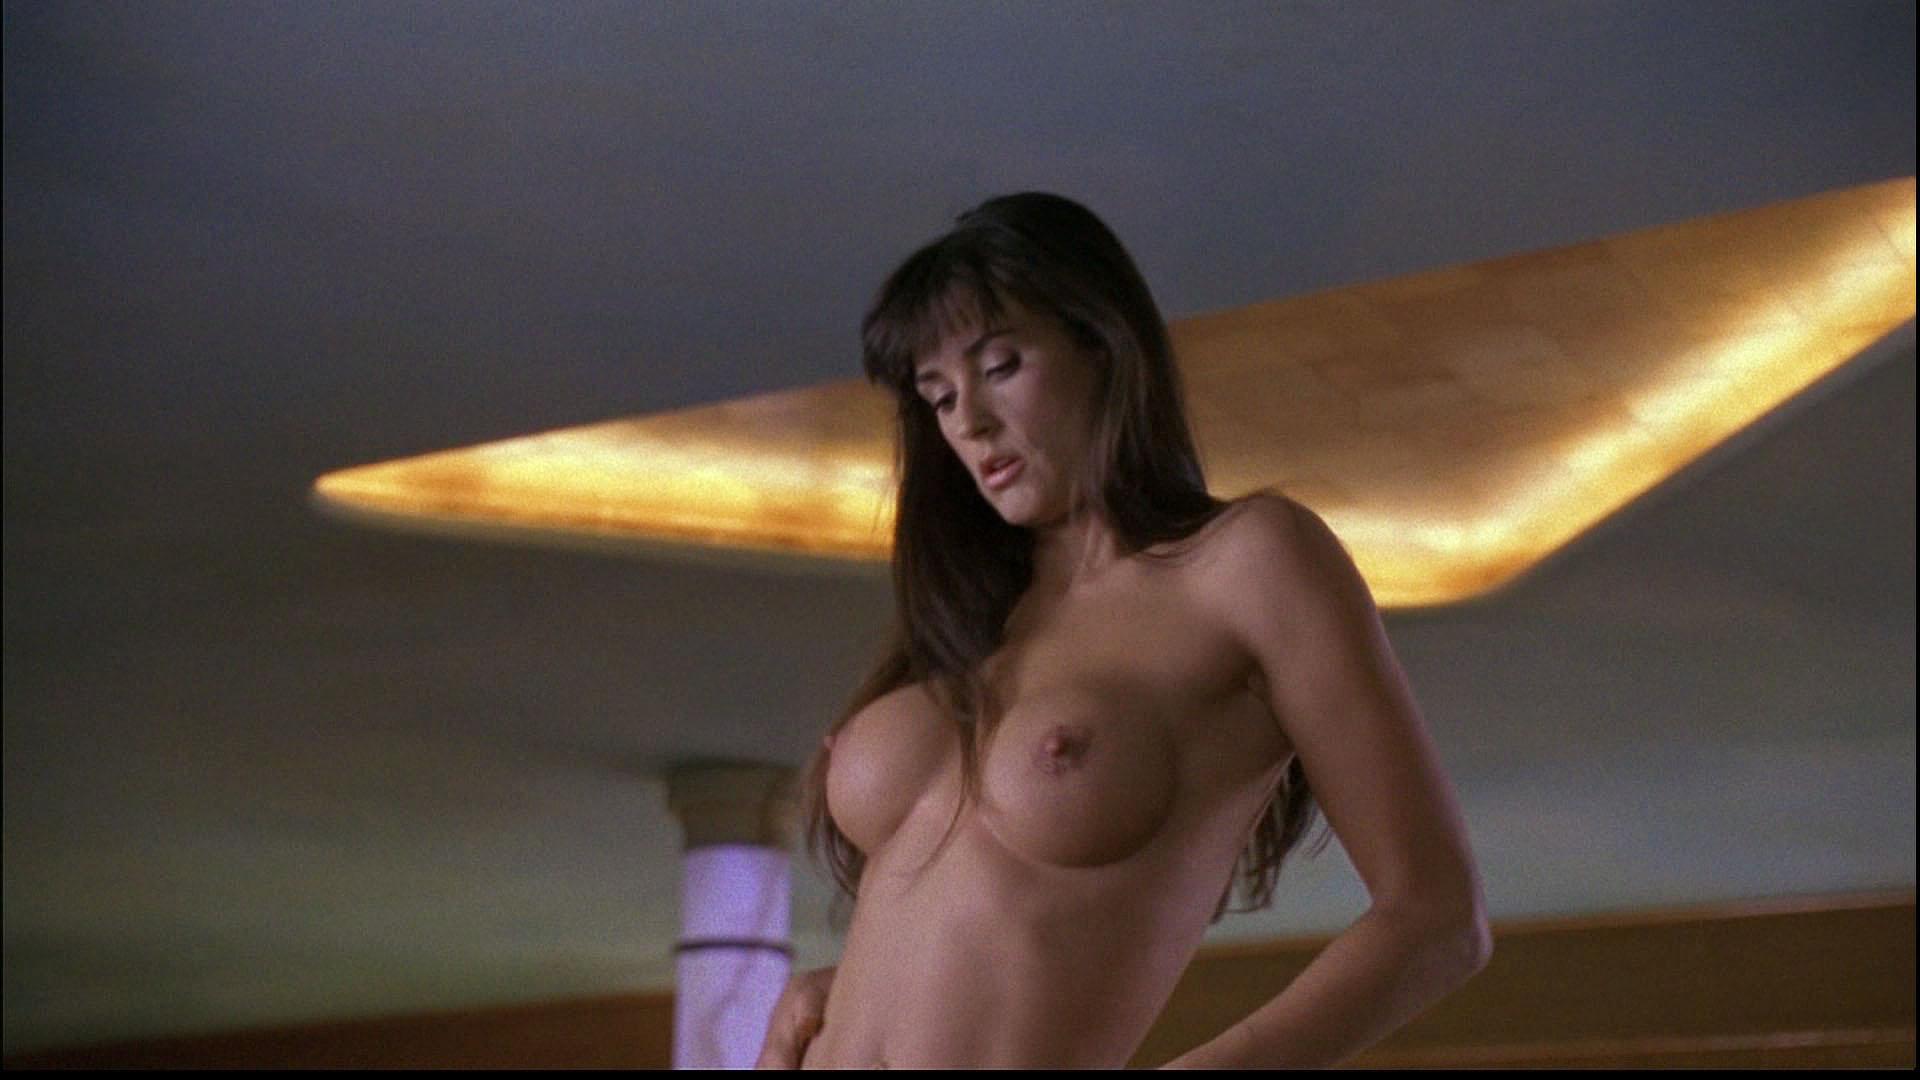 striptiz-i-erotika-v-hd-kachestve